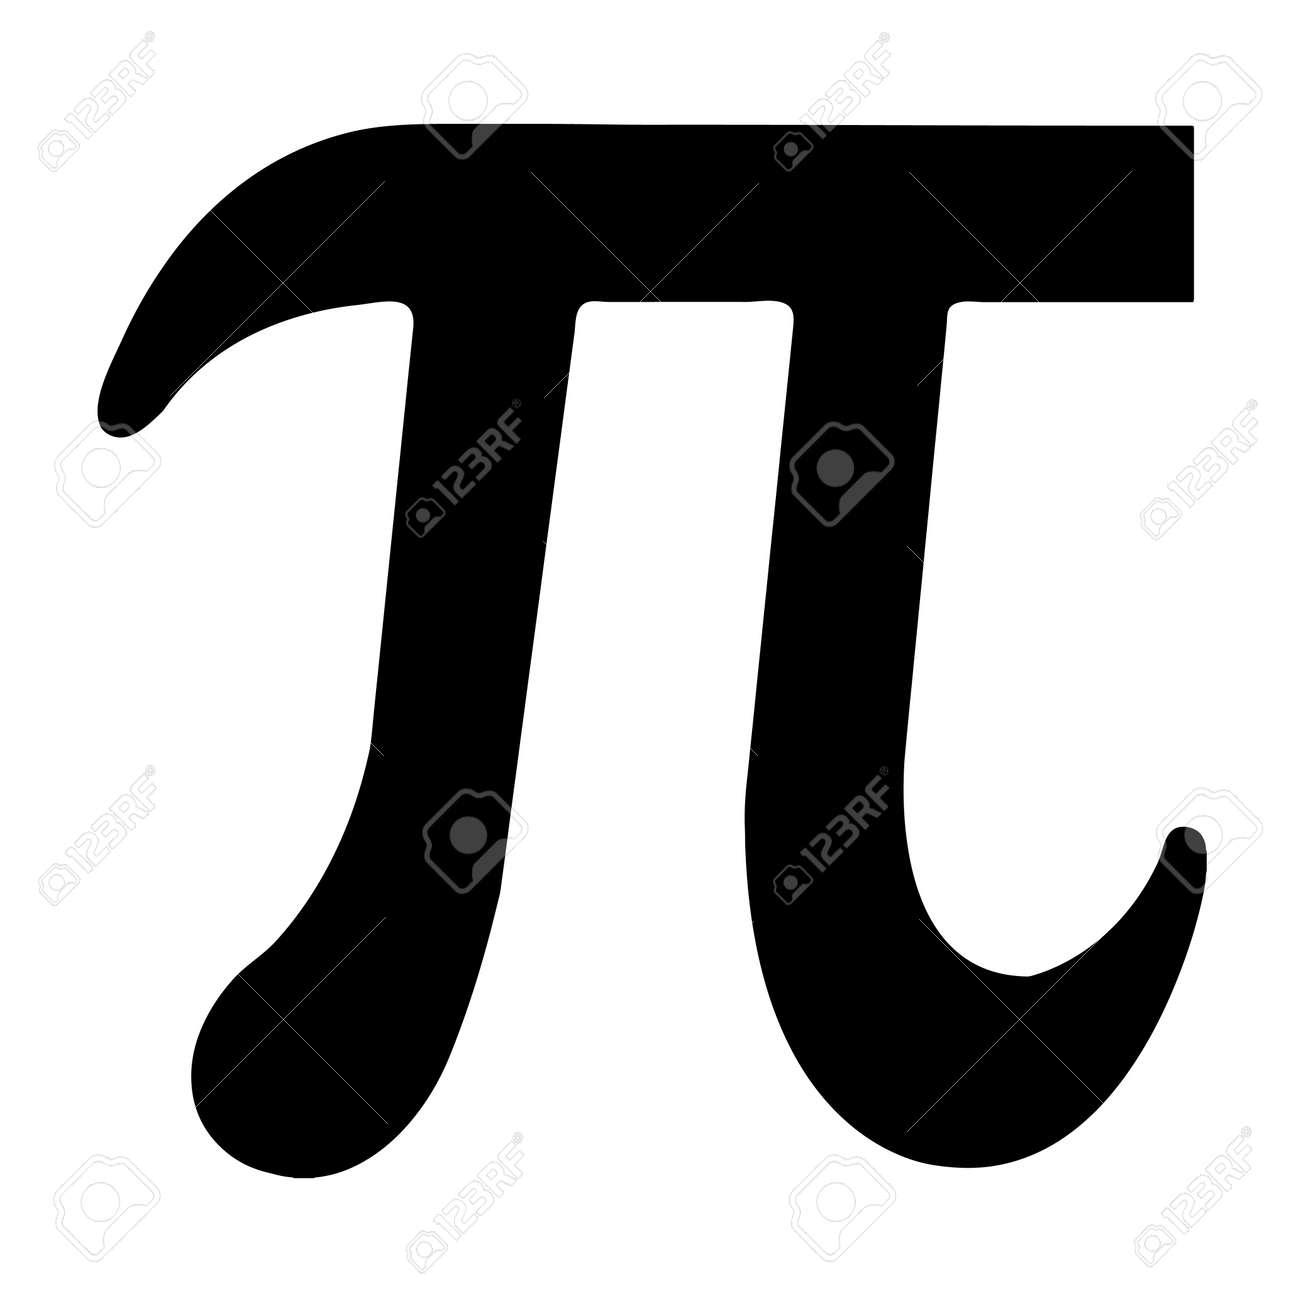 Illustrated black Pi symbol - 56300805